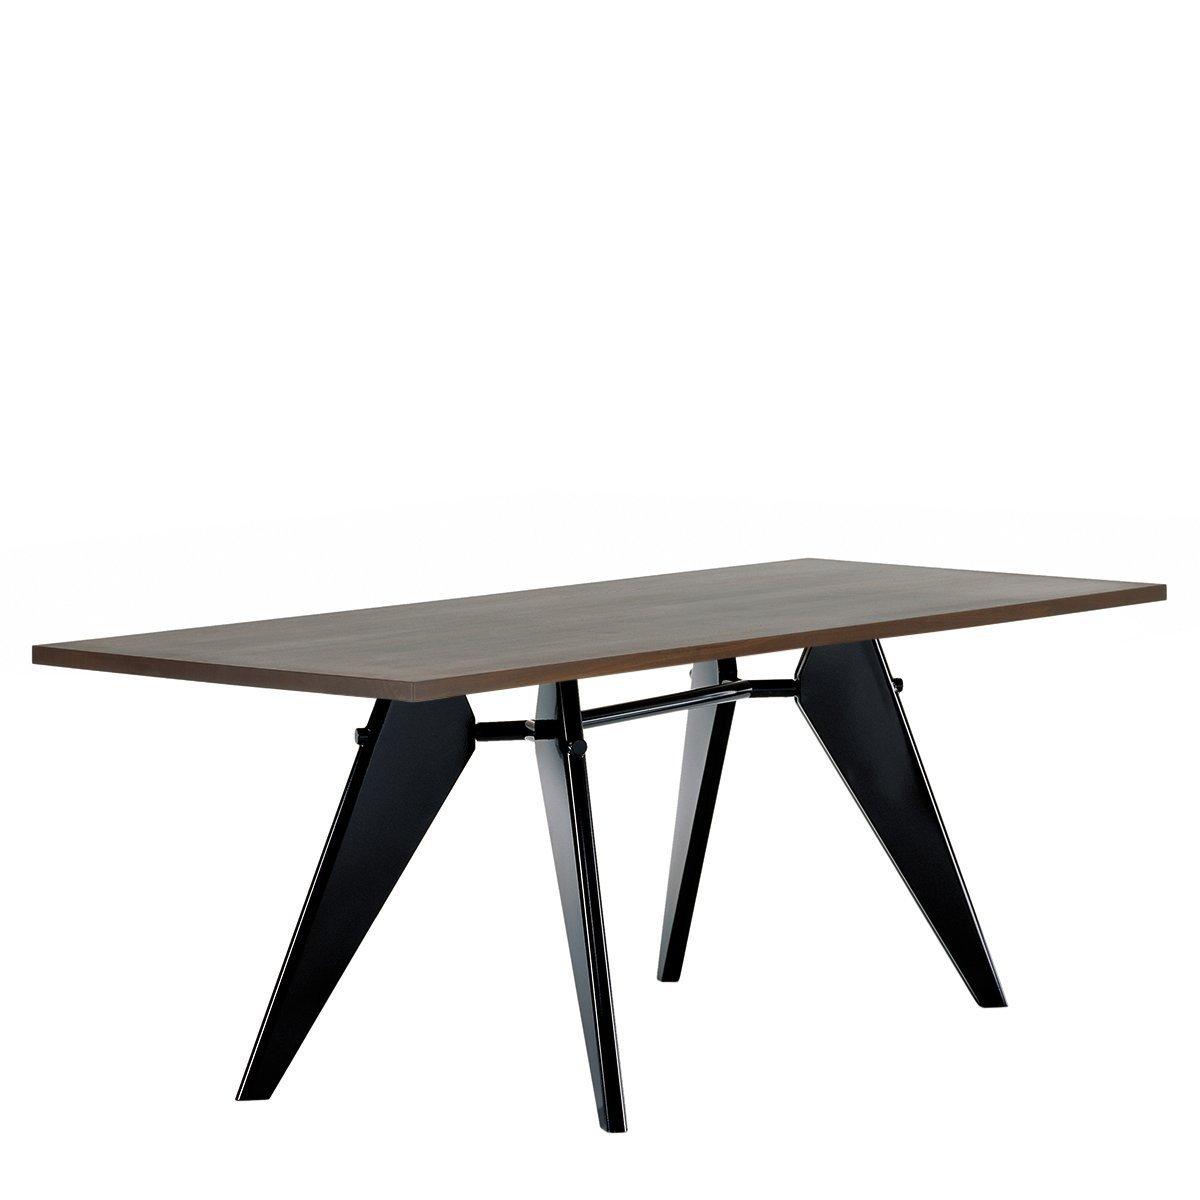 Vitra EM Eettafel - Gerookt Eiken - Zwart - 200 x 90 cm.